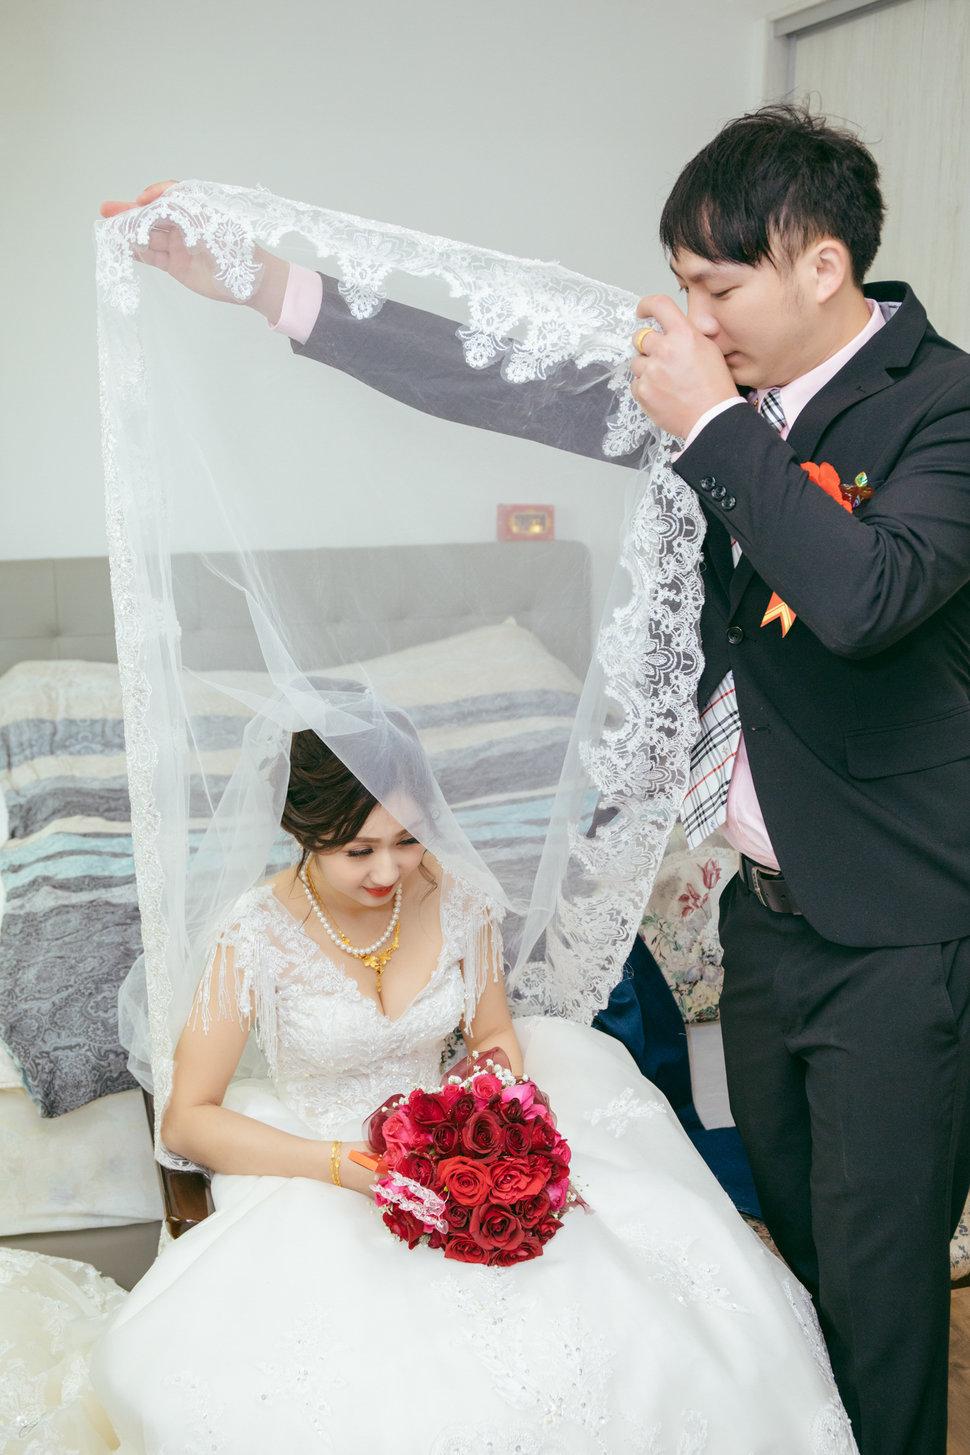 HAO_9931 - J.H Photography維納斯婚禮 - 結婚吧